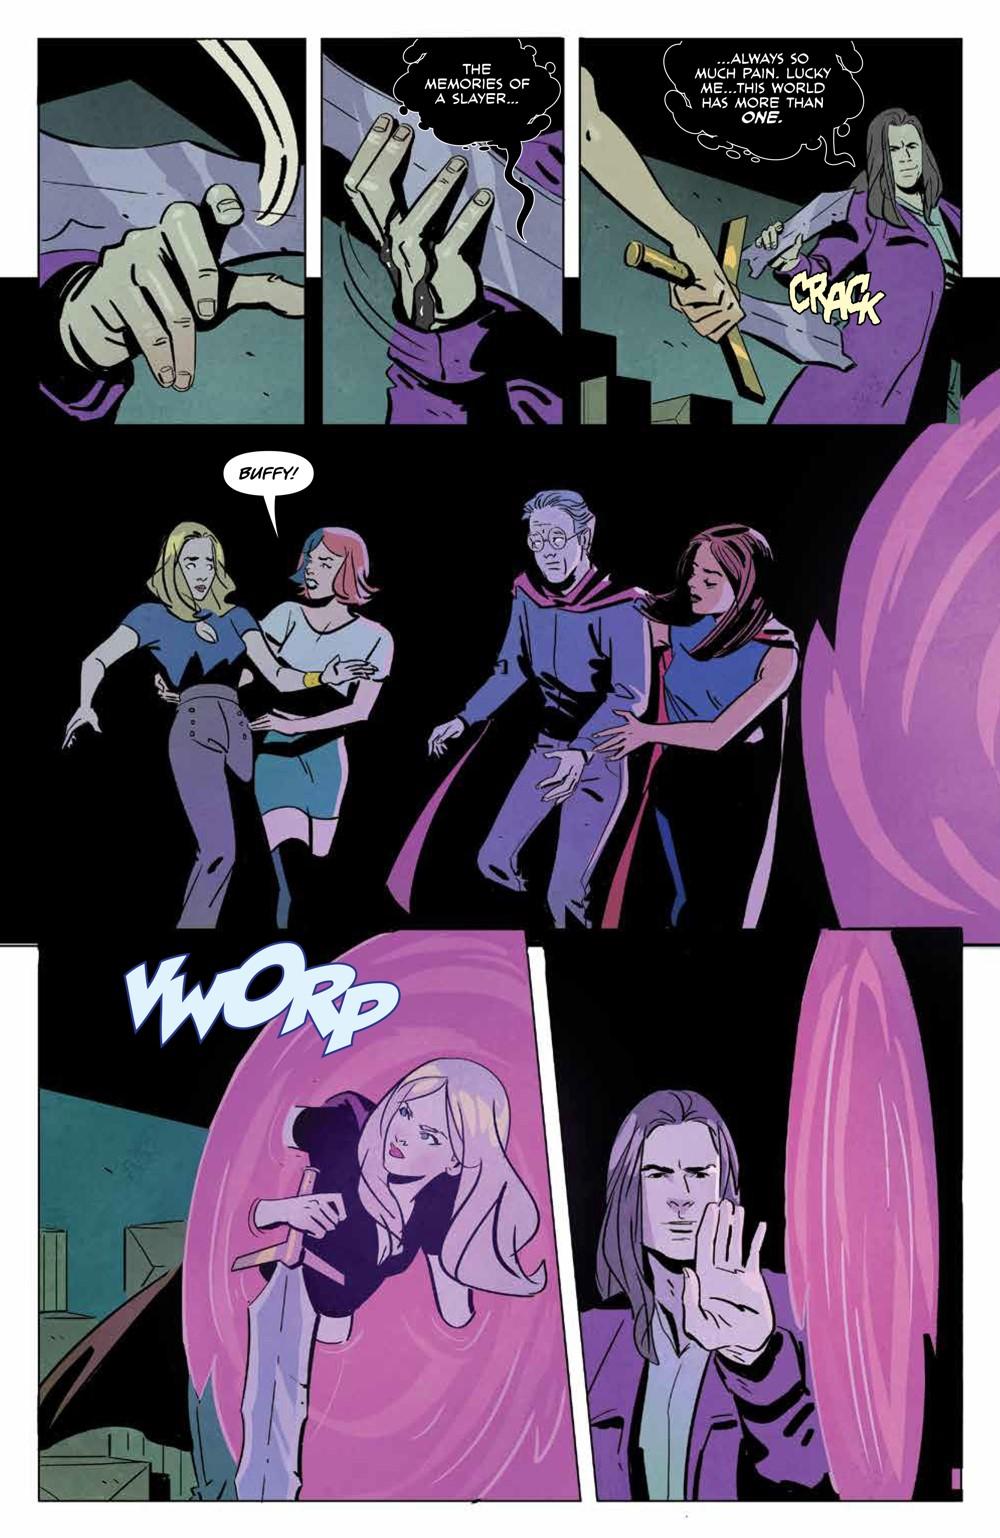 Buffy_030_PRESS_8 ComicList Previews: BUFFY THE VAMPIRE SLAYER #30